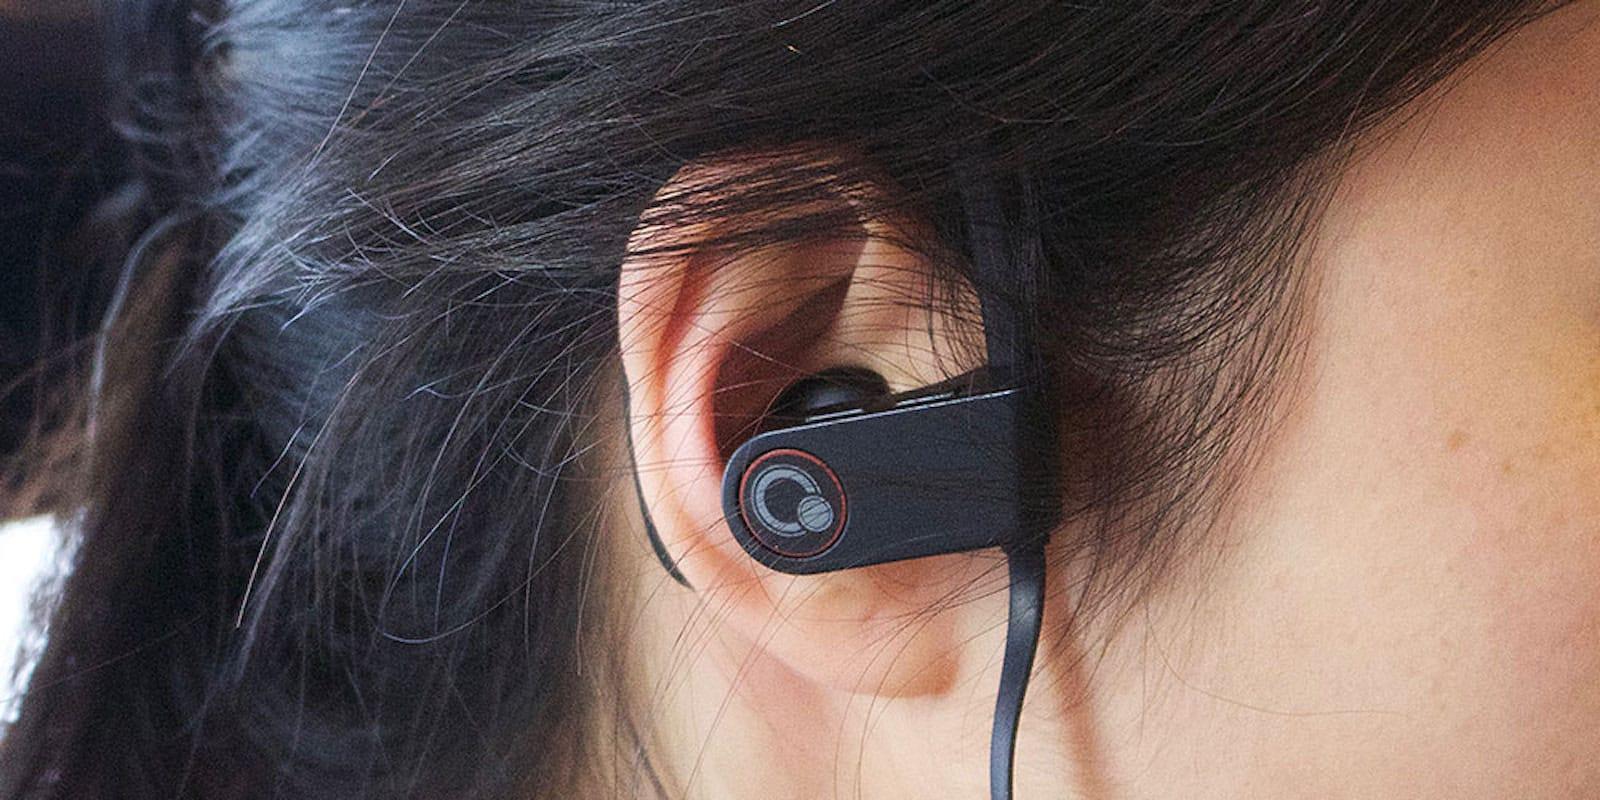 Que Bluetooth earbuds In-Ear Headphones- 2-Pack